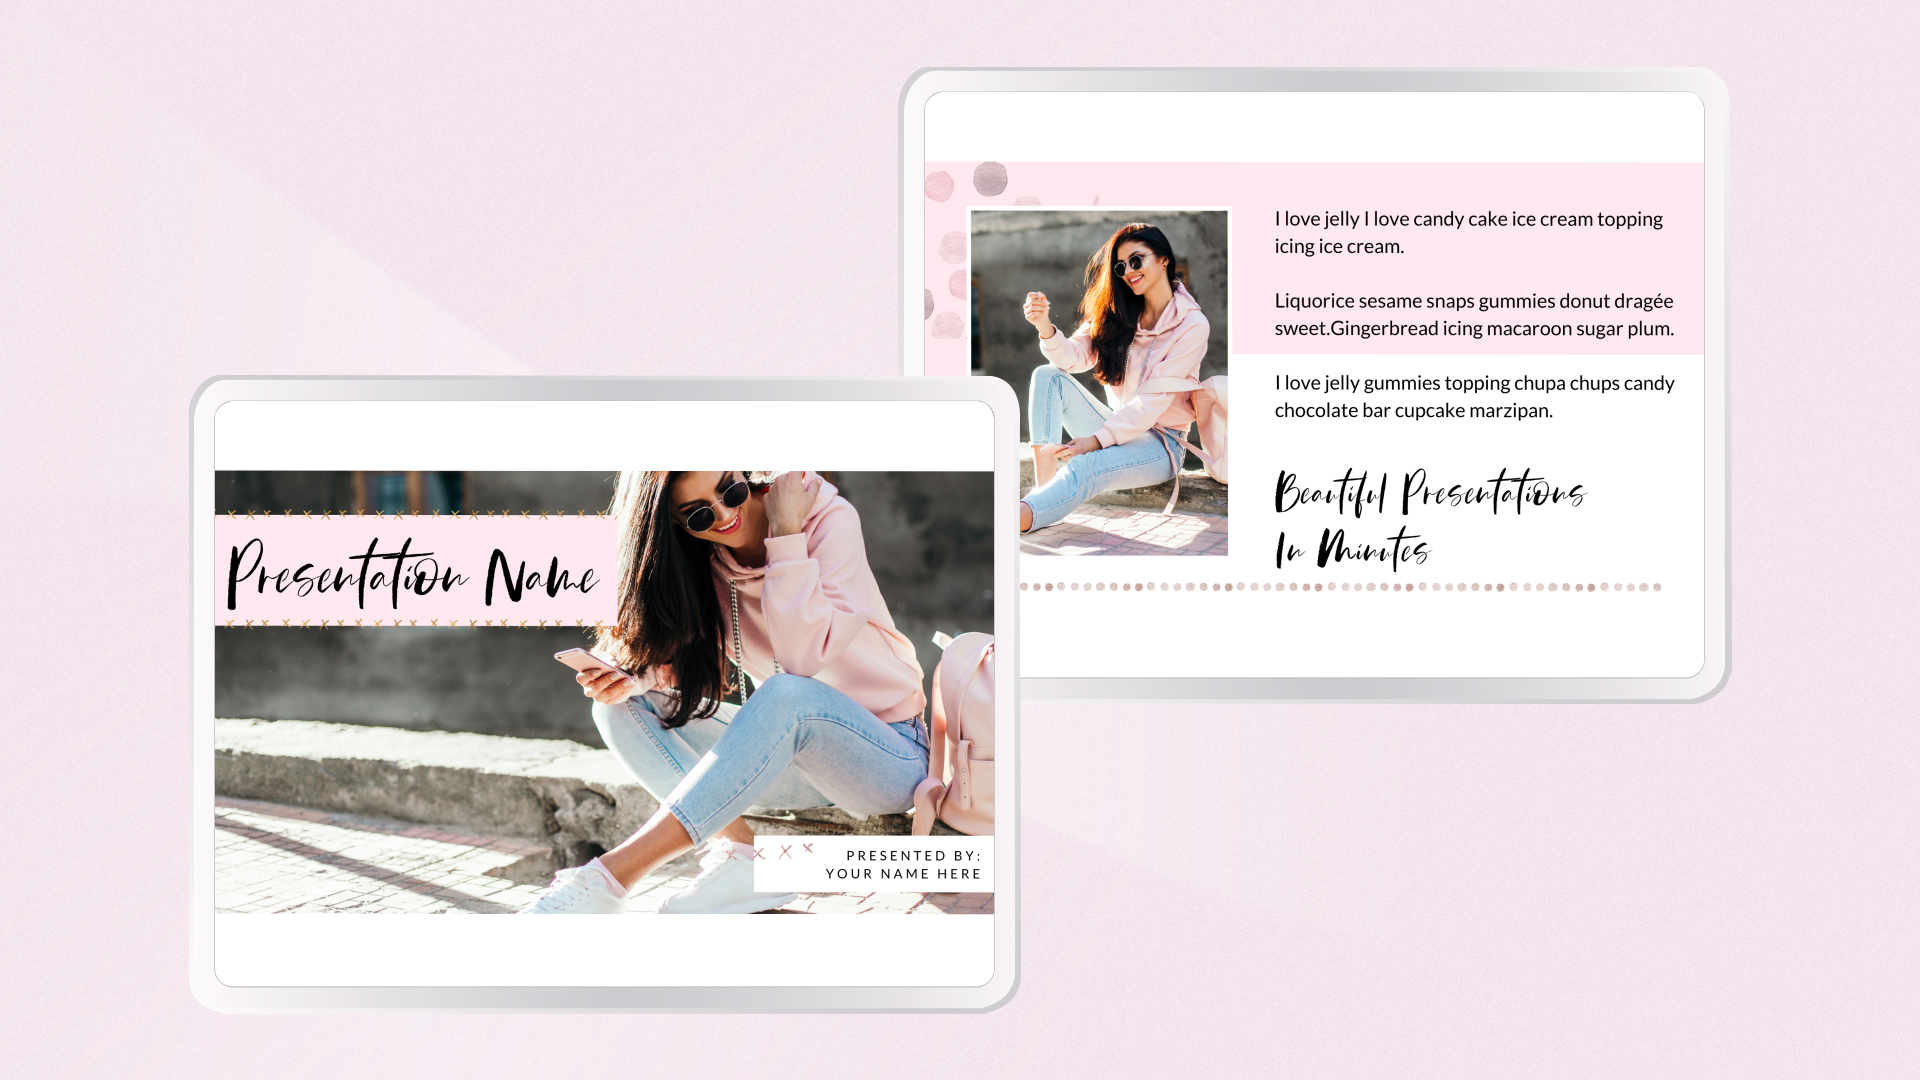 Diva Dior Slide Deck Canva Template - Diva Dior 18